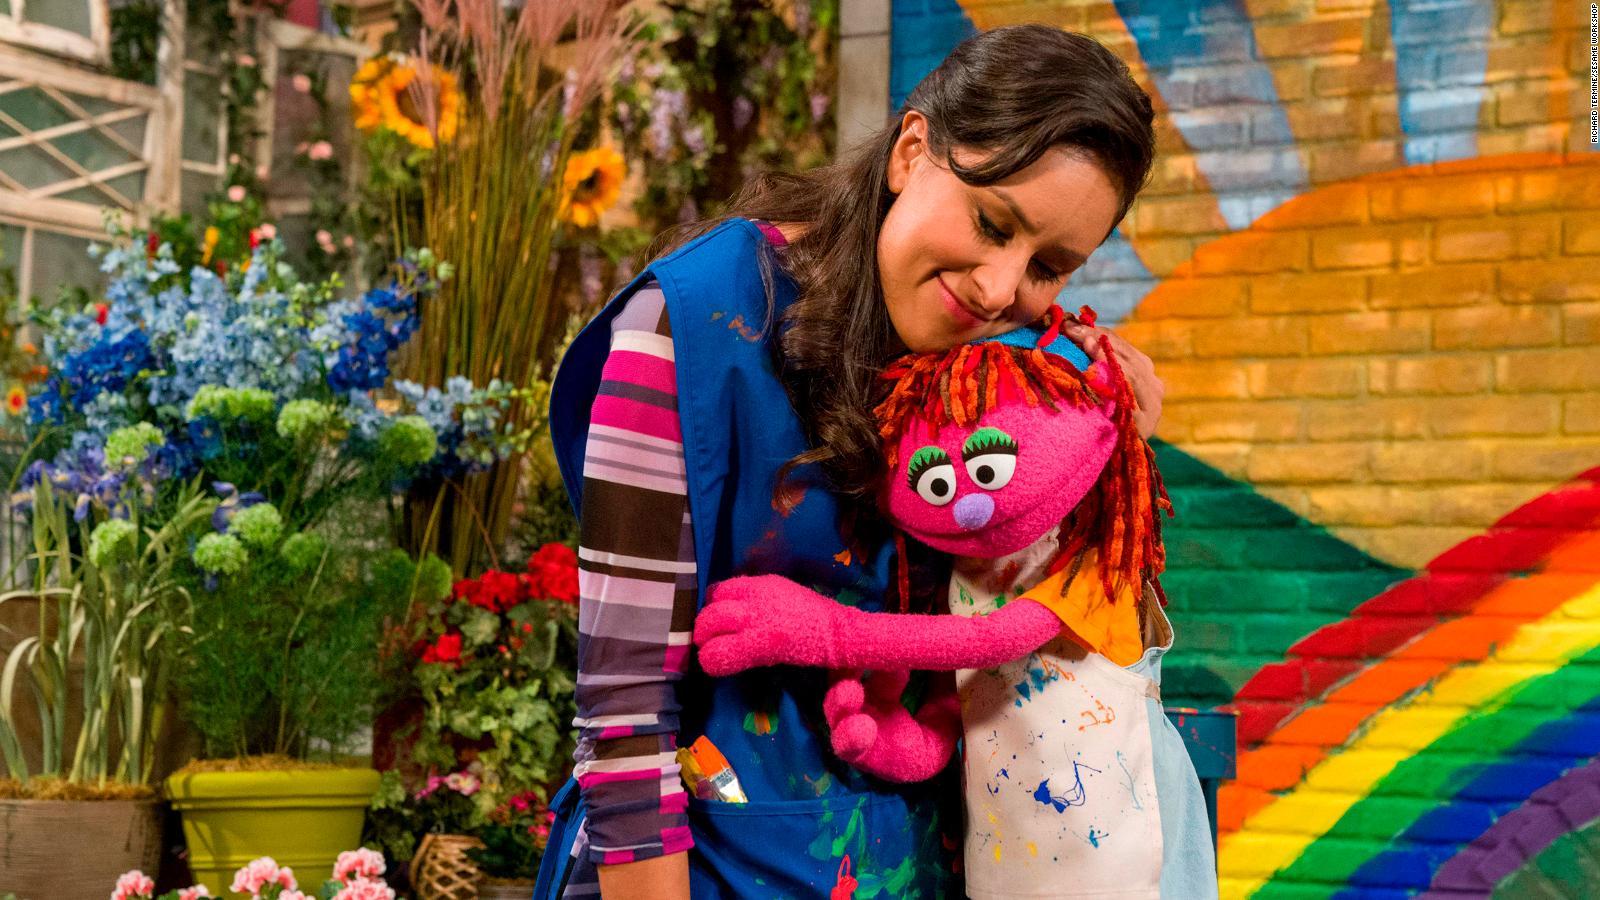 'Sesame Street' Muppet becomes homeless